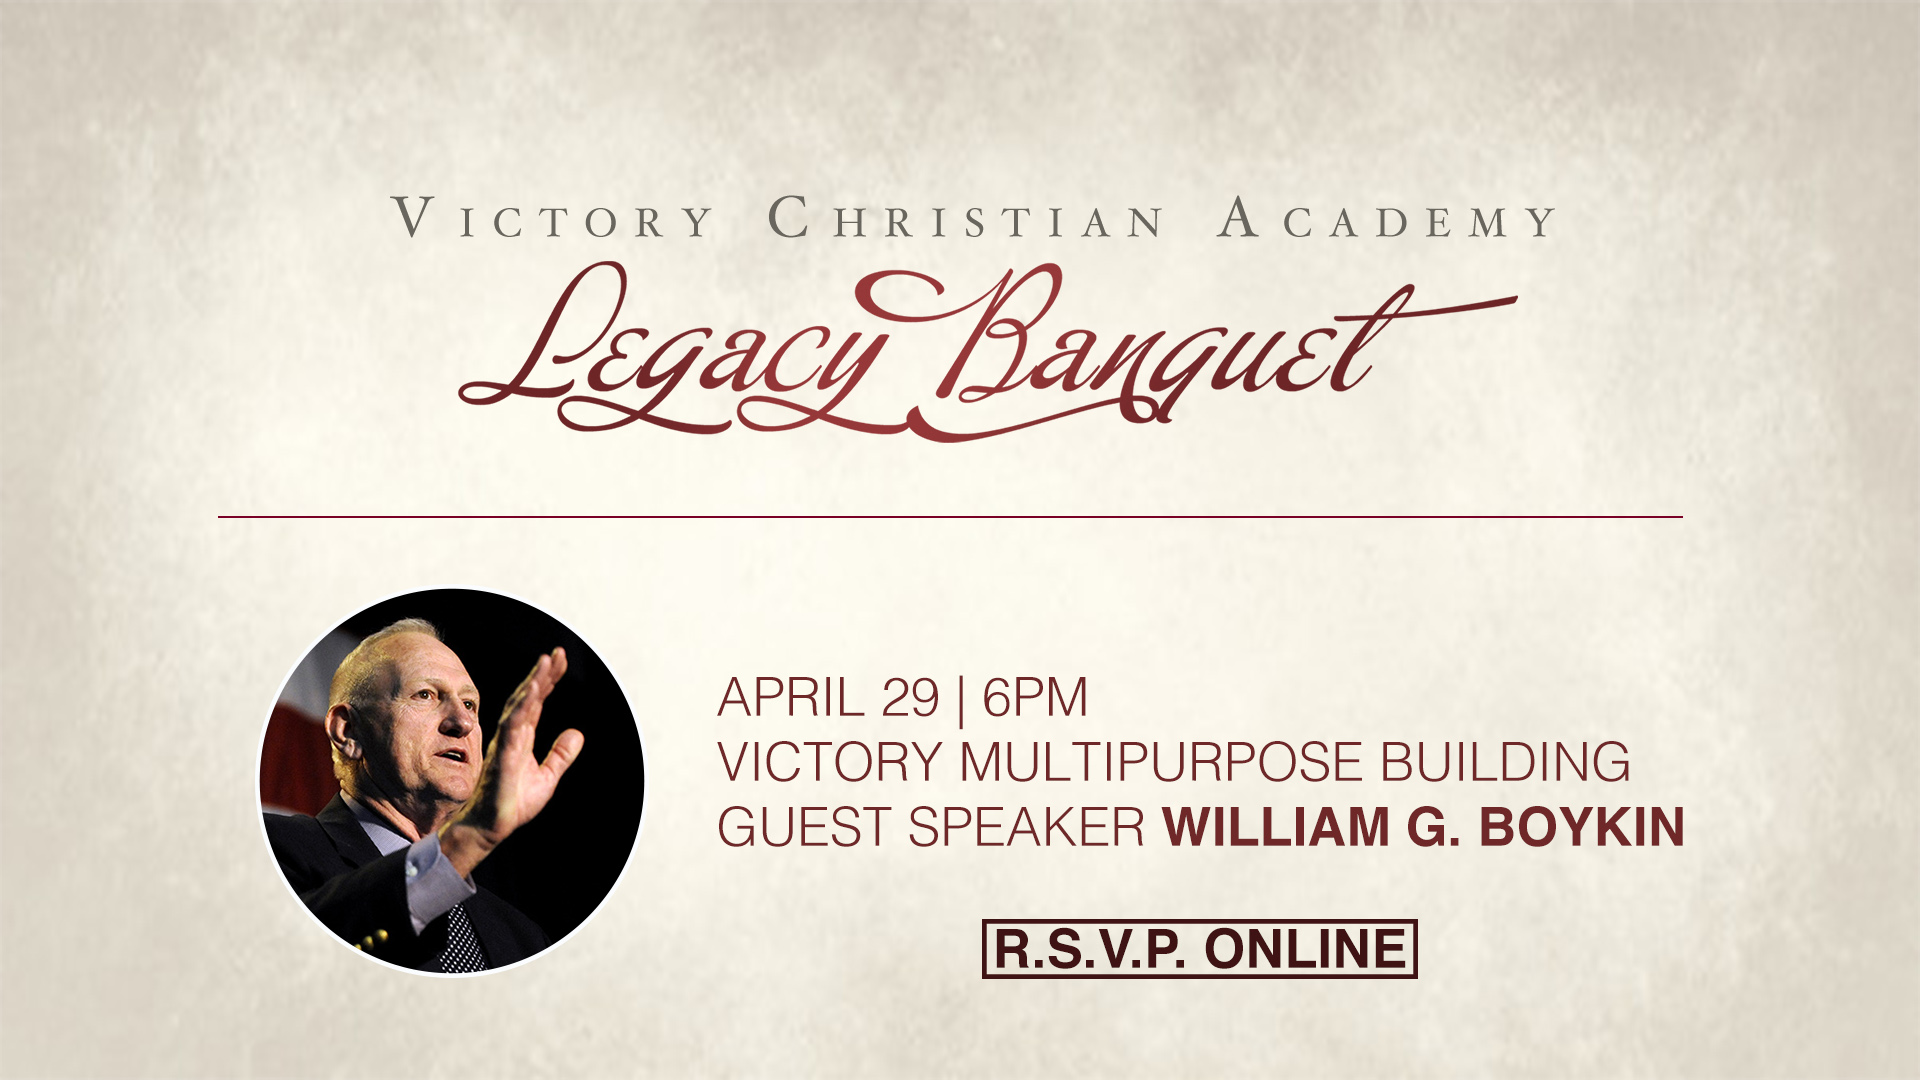 Legacy banquet logo full